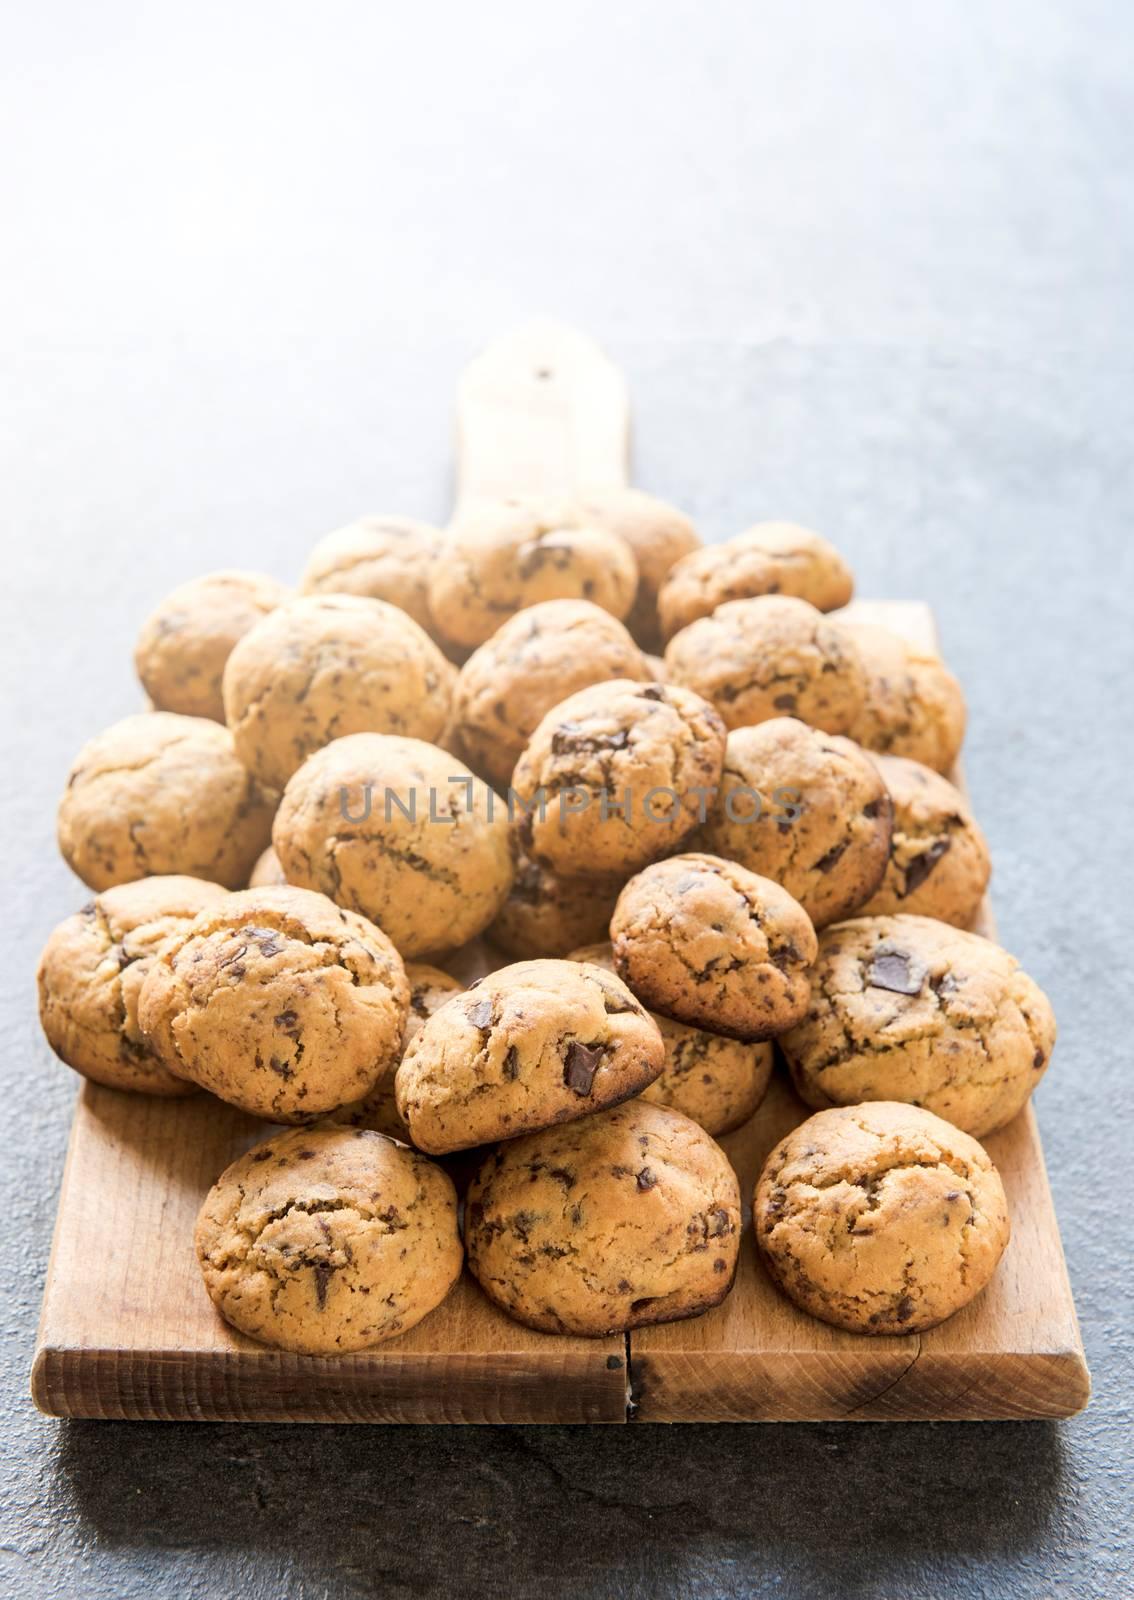 Homemade mini cookies with dark chocolate, selective focus